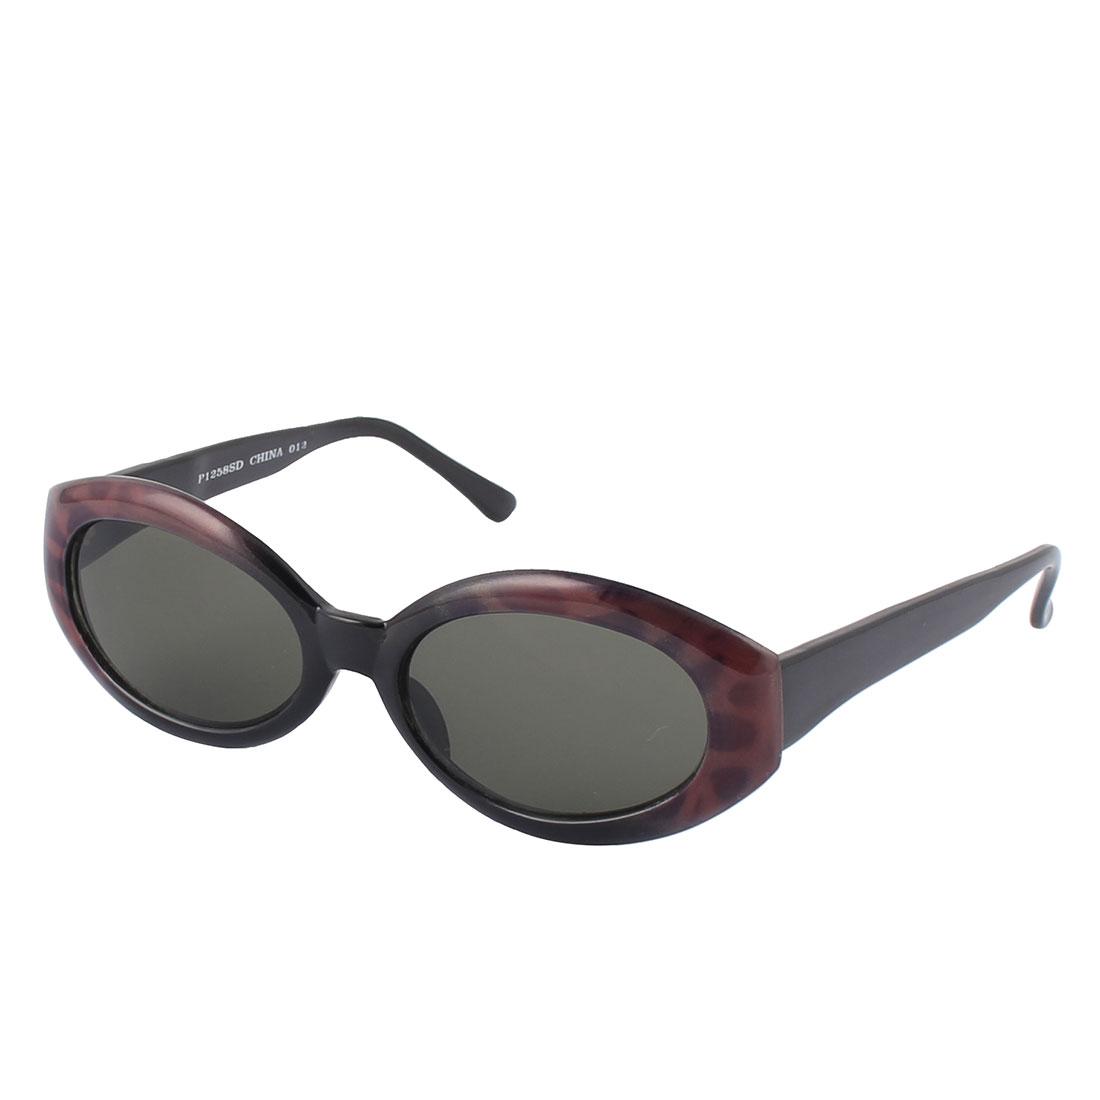 Lady Plastic Round Leopard Pattern Full Rim Flame Sun Shield Lens Sunglasses Black